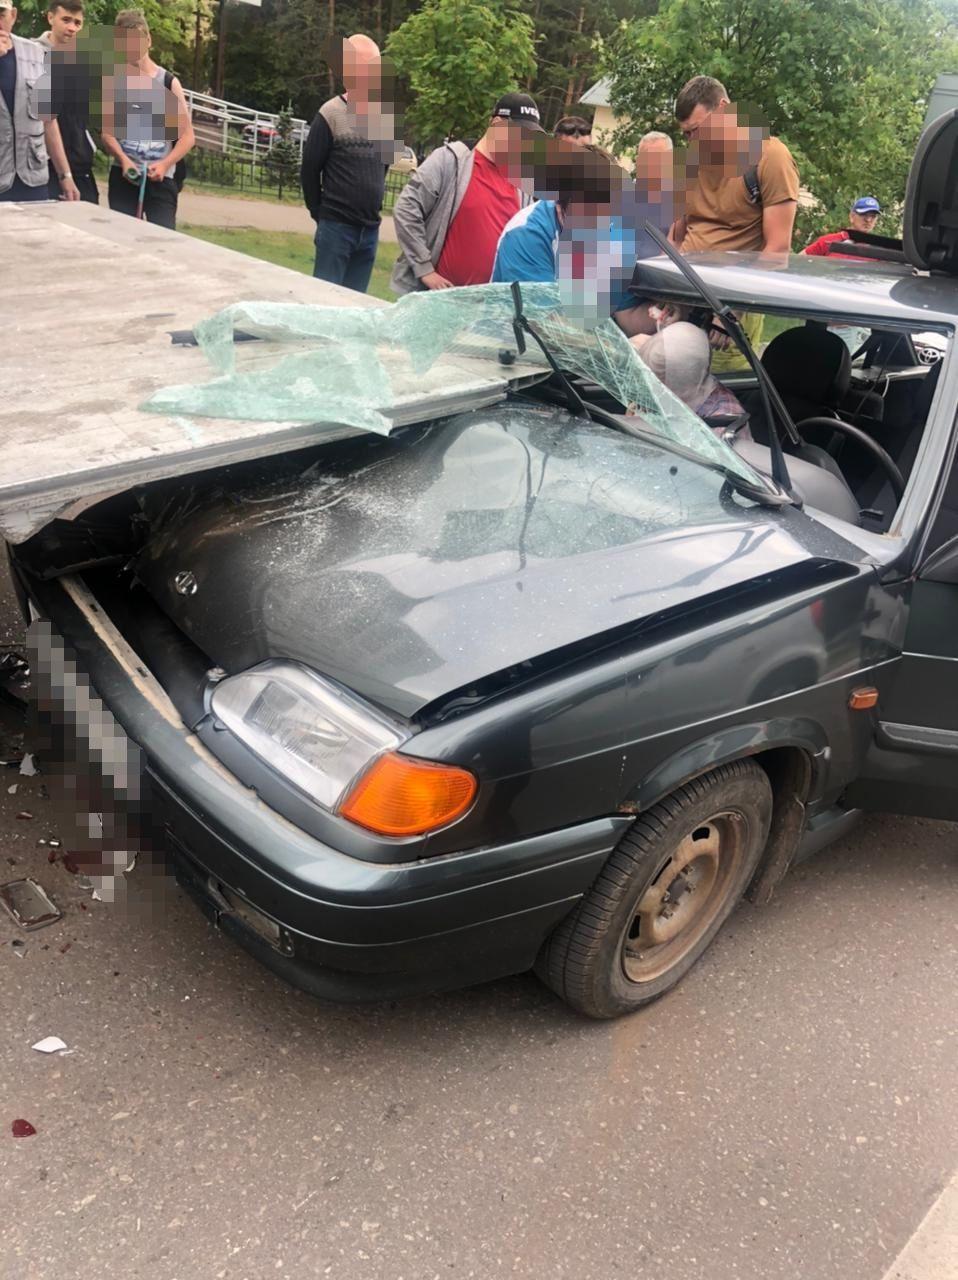 Пенсионер в Татарстане влетел в стоячий грузовик